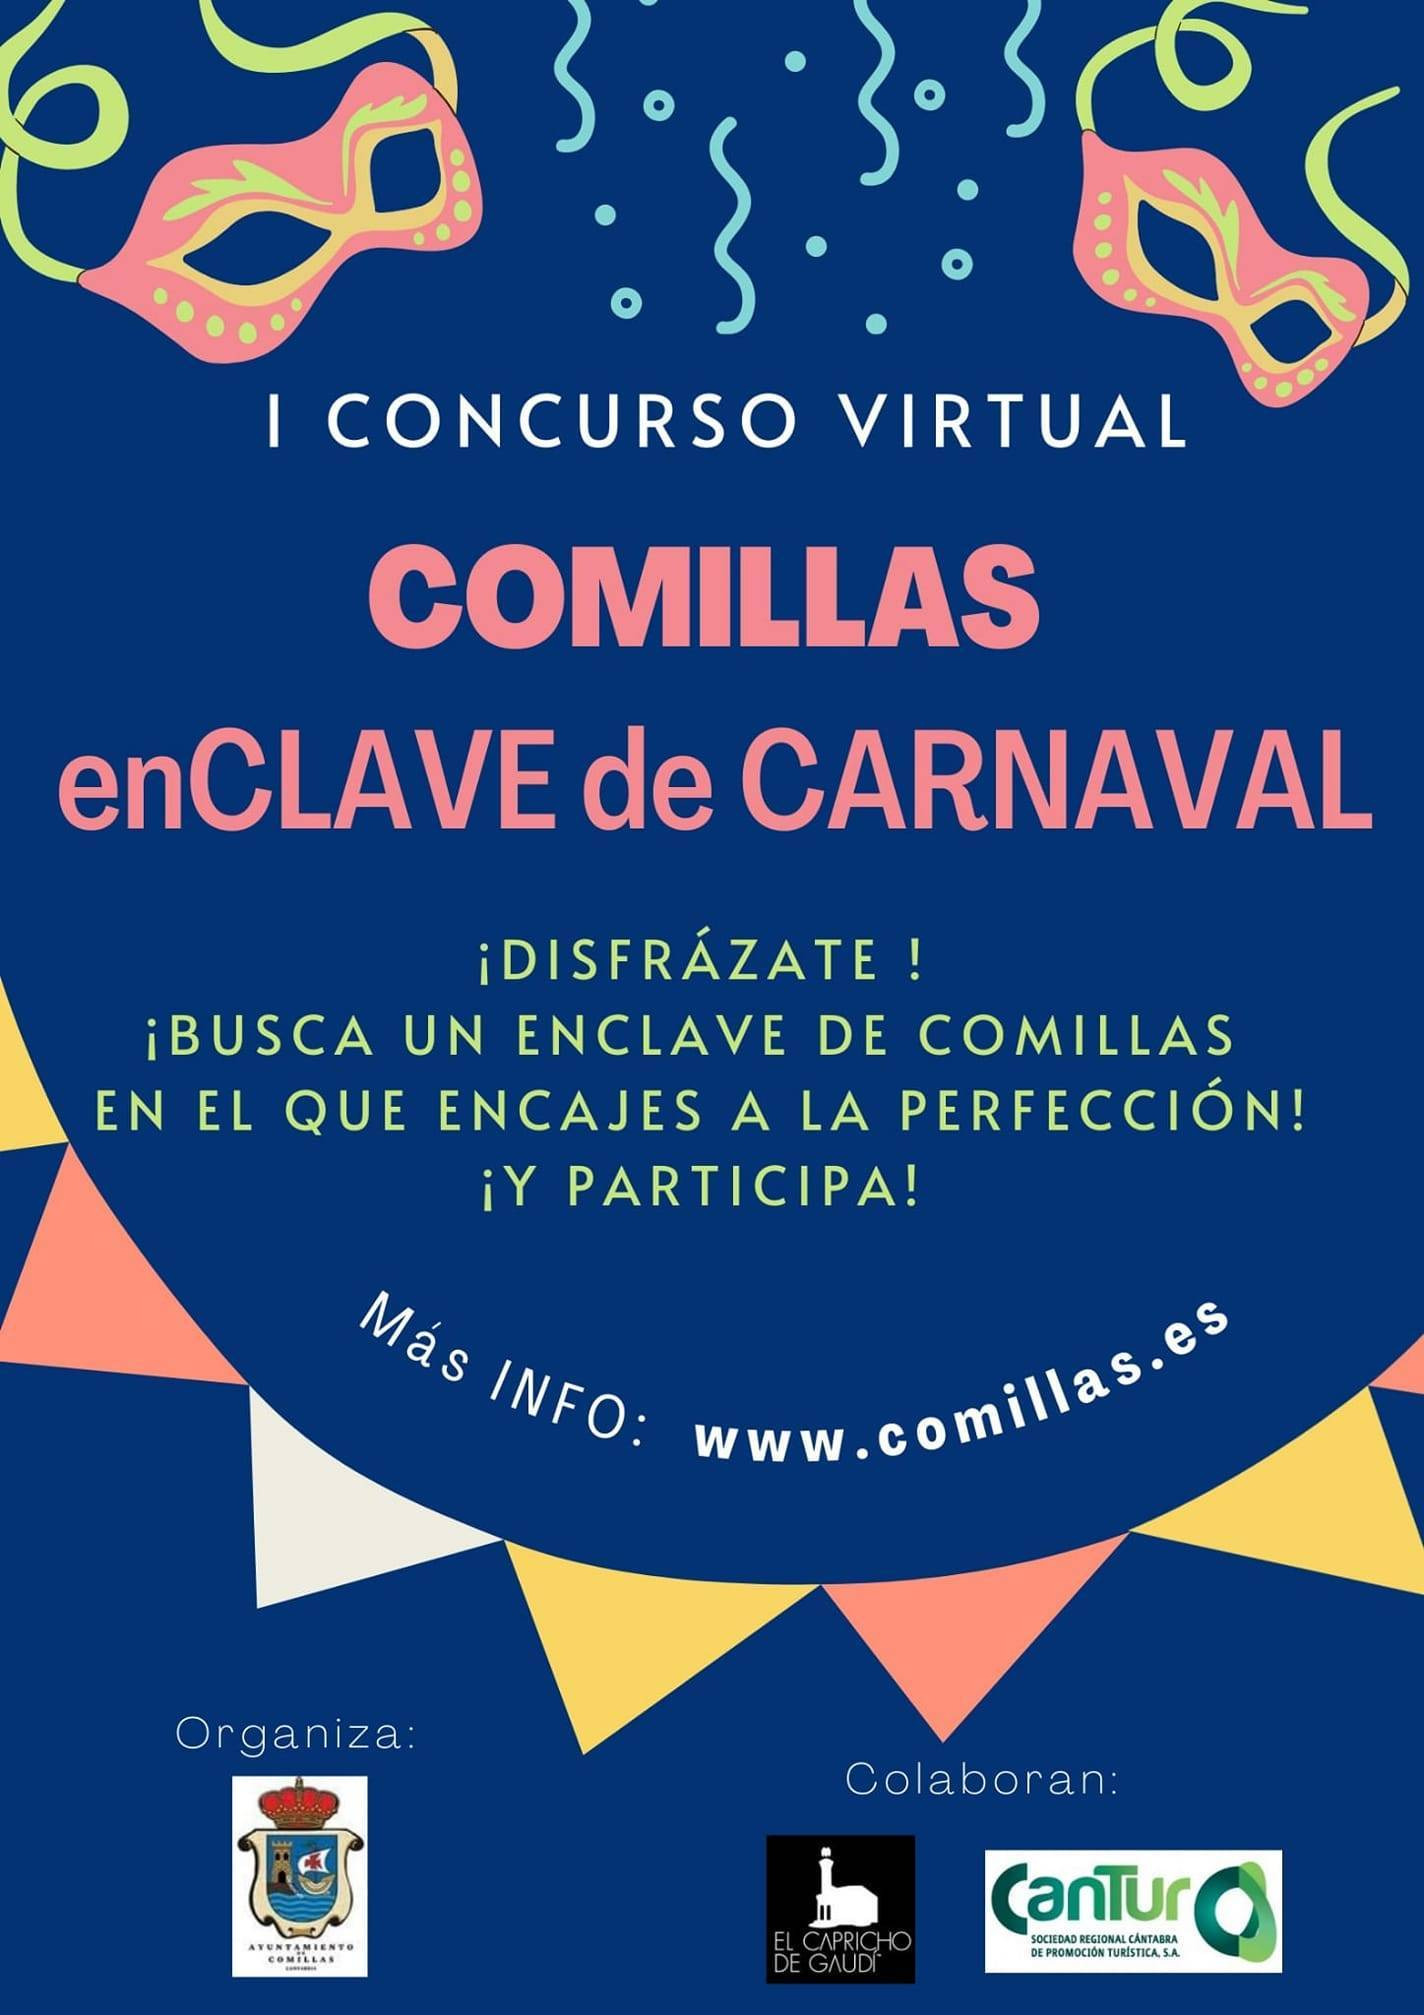 I concurso virtual de carnaval - Comillas (Cantabria)